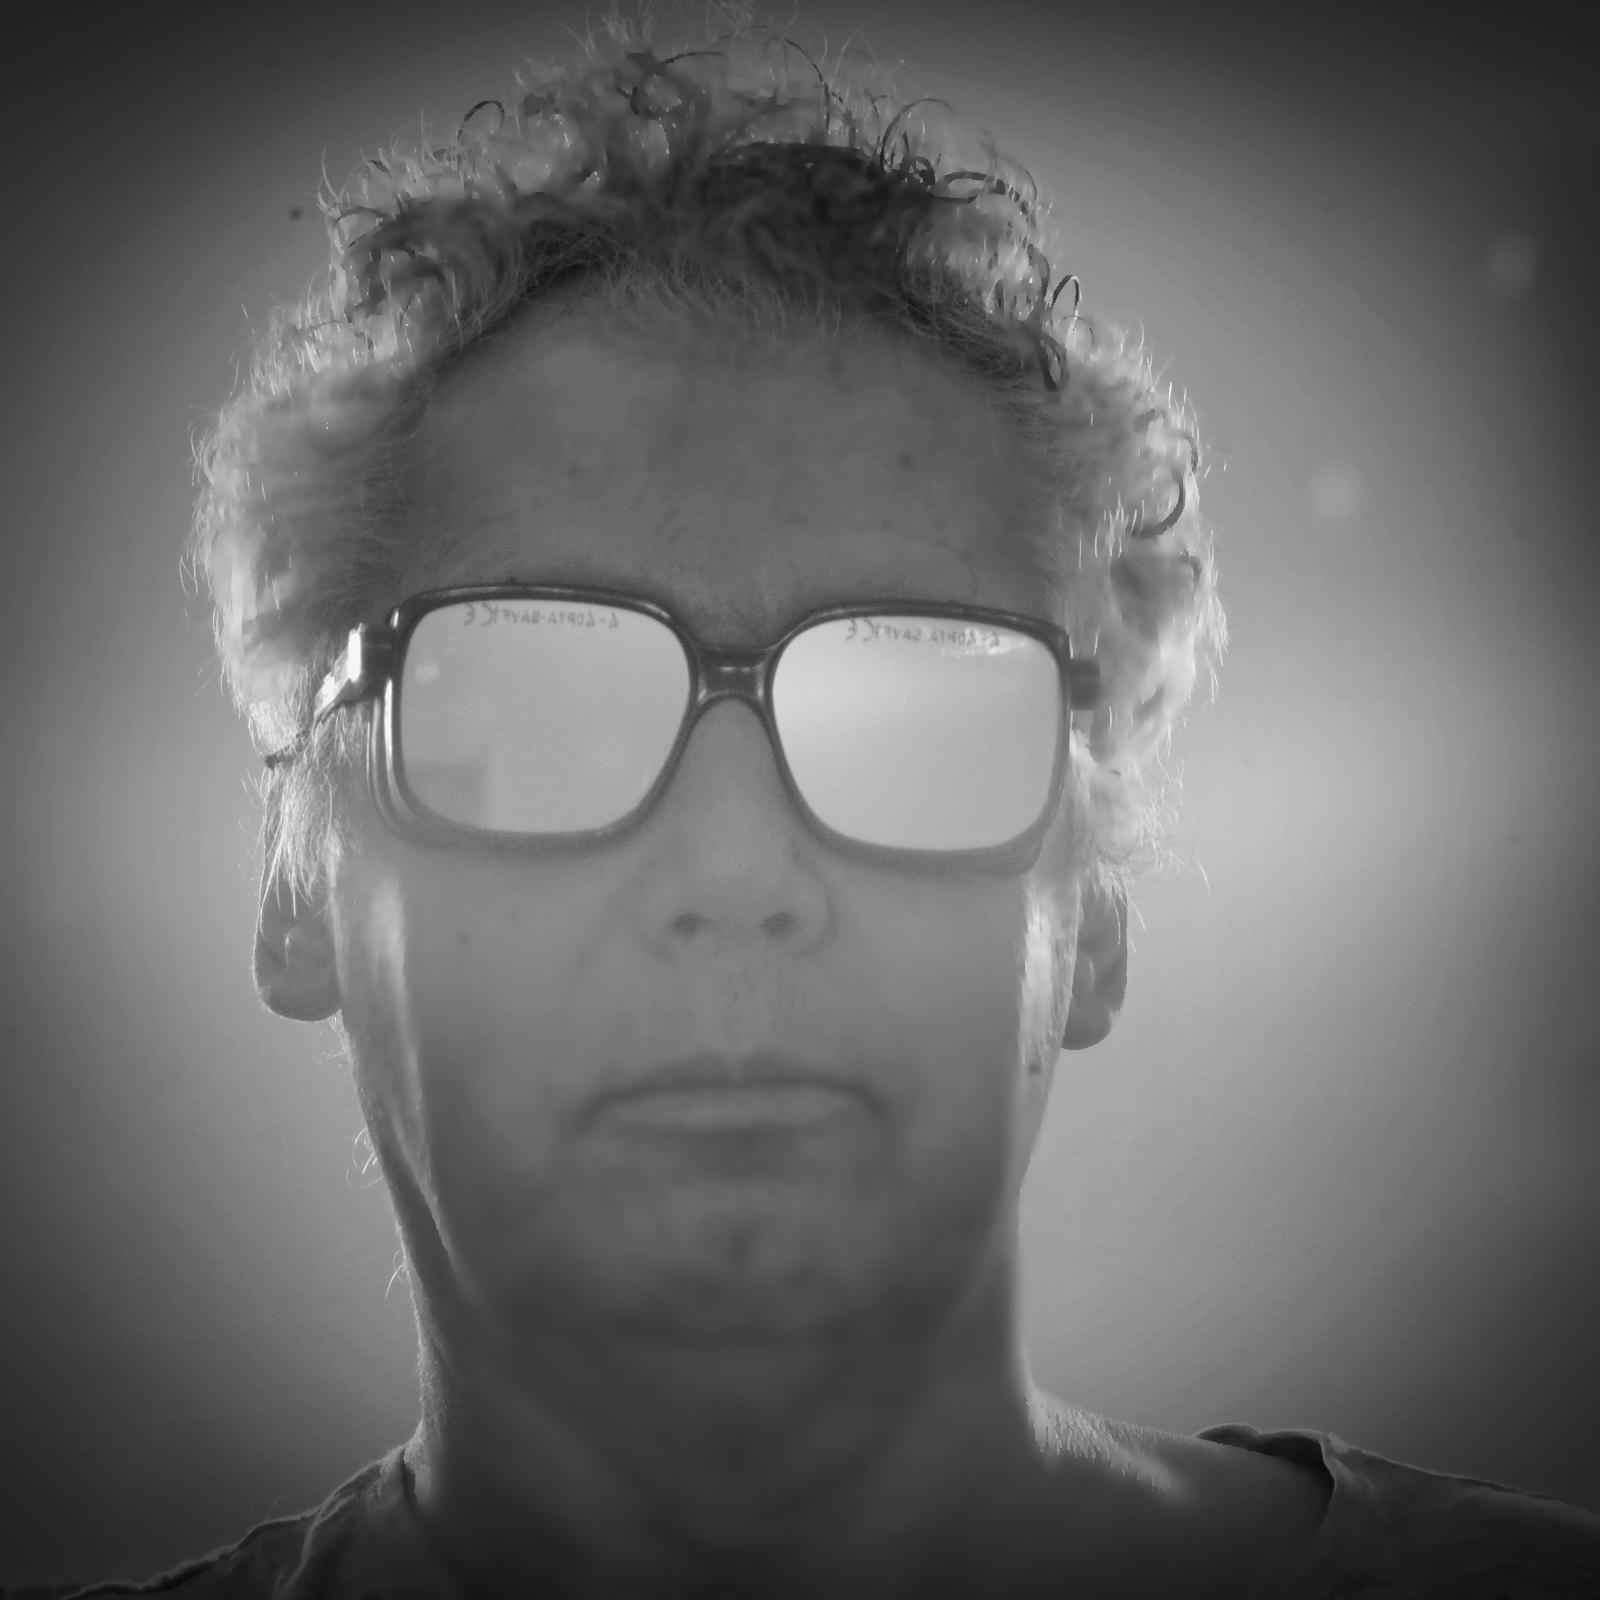 Selfie_jarek_brzezinski